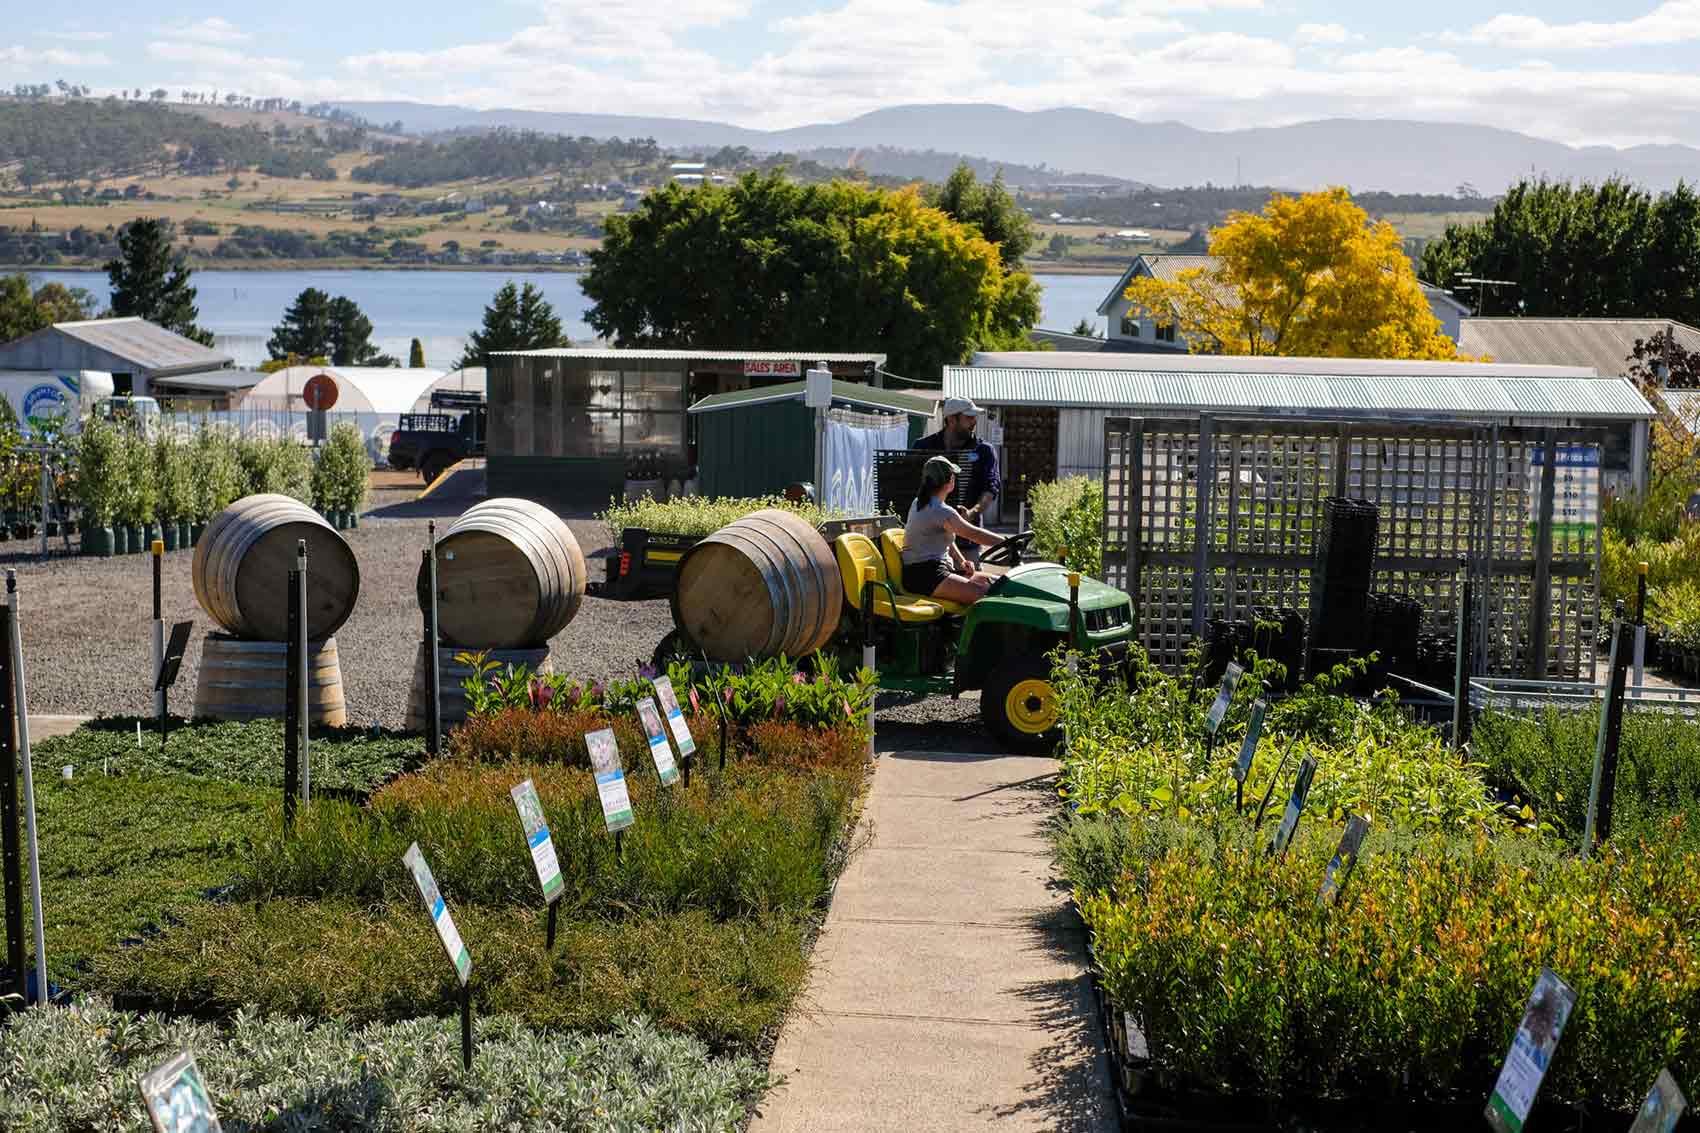 granton-plants-nursery-hobart-tasmania-launceston